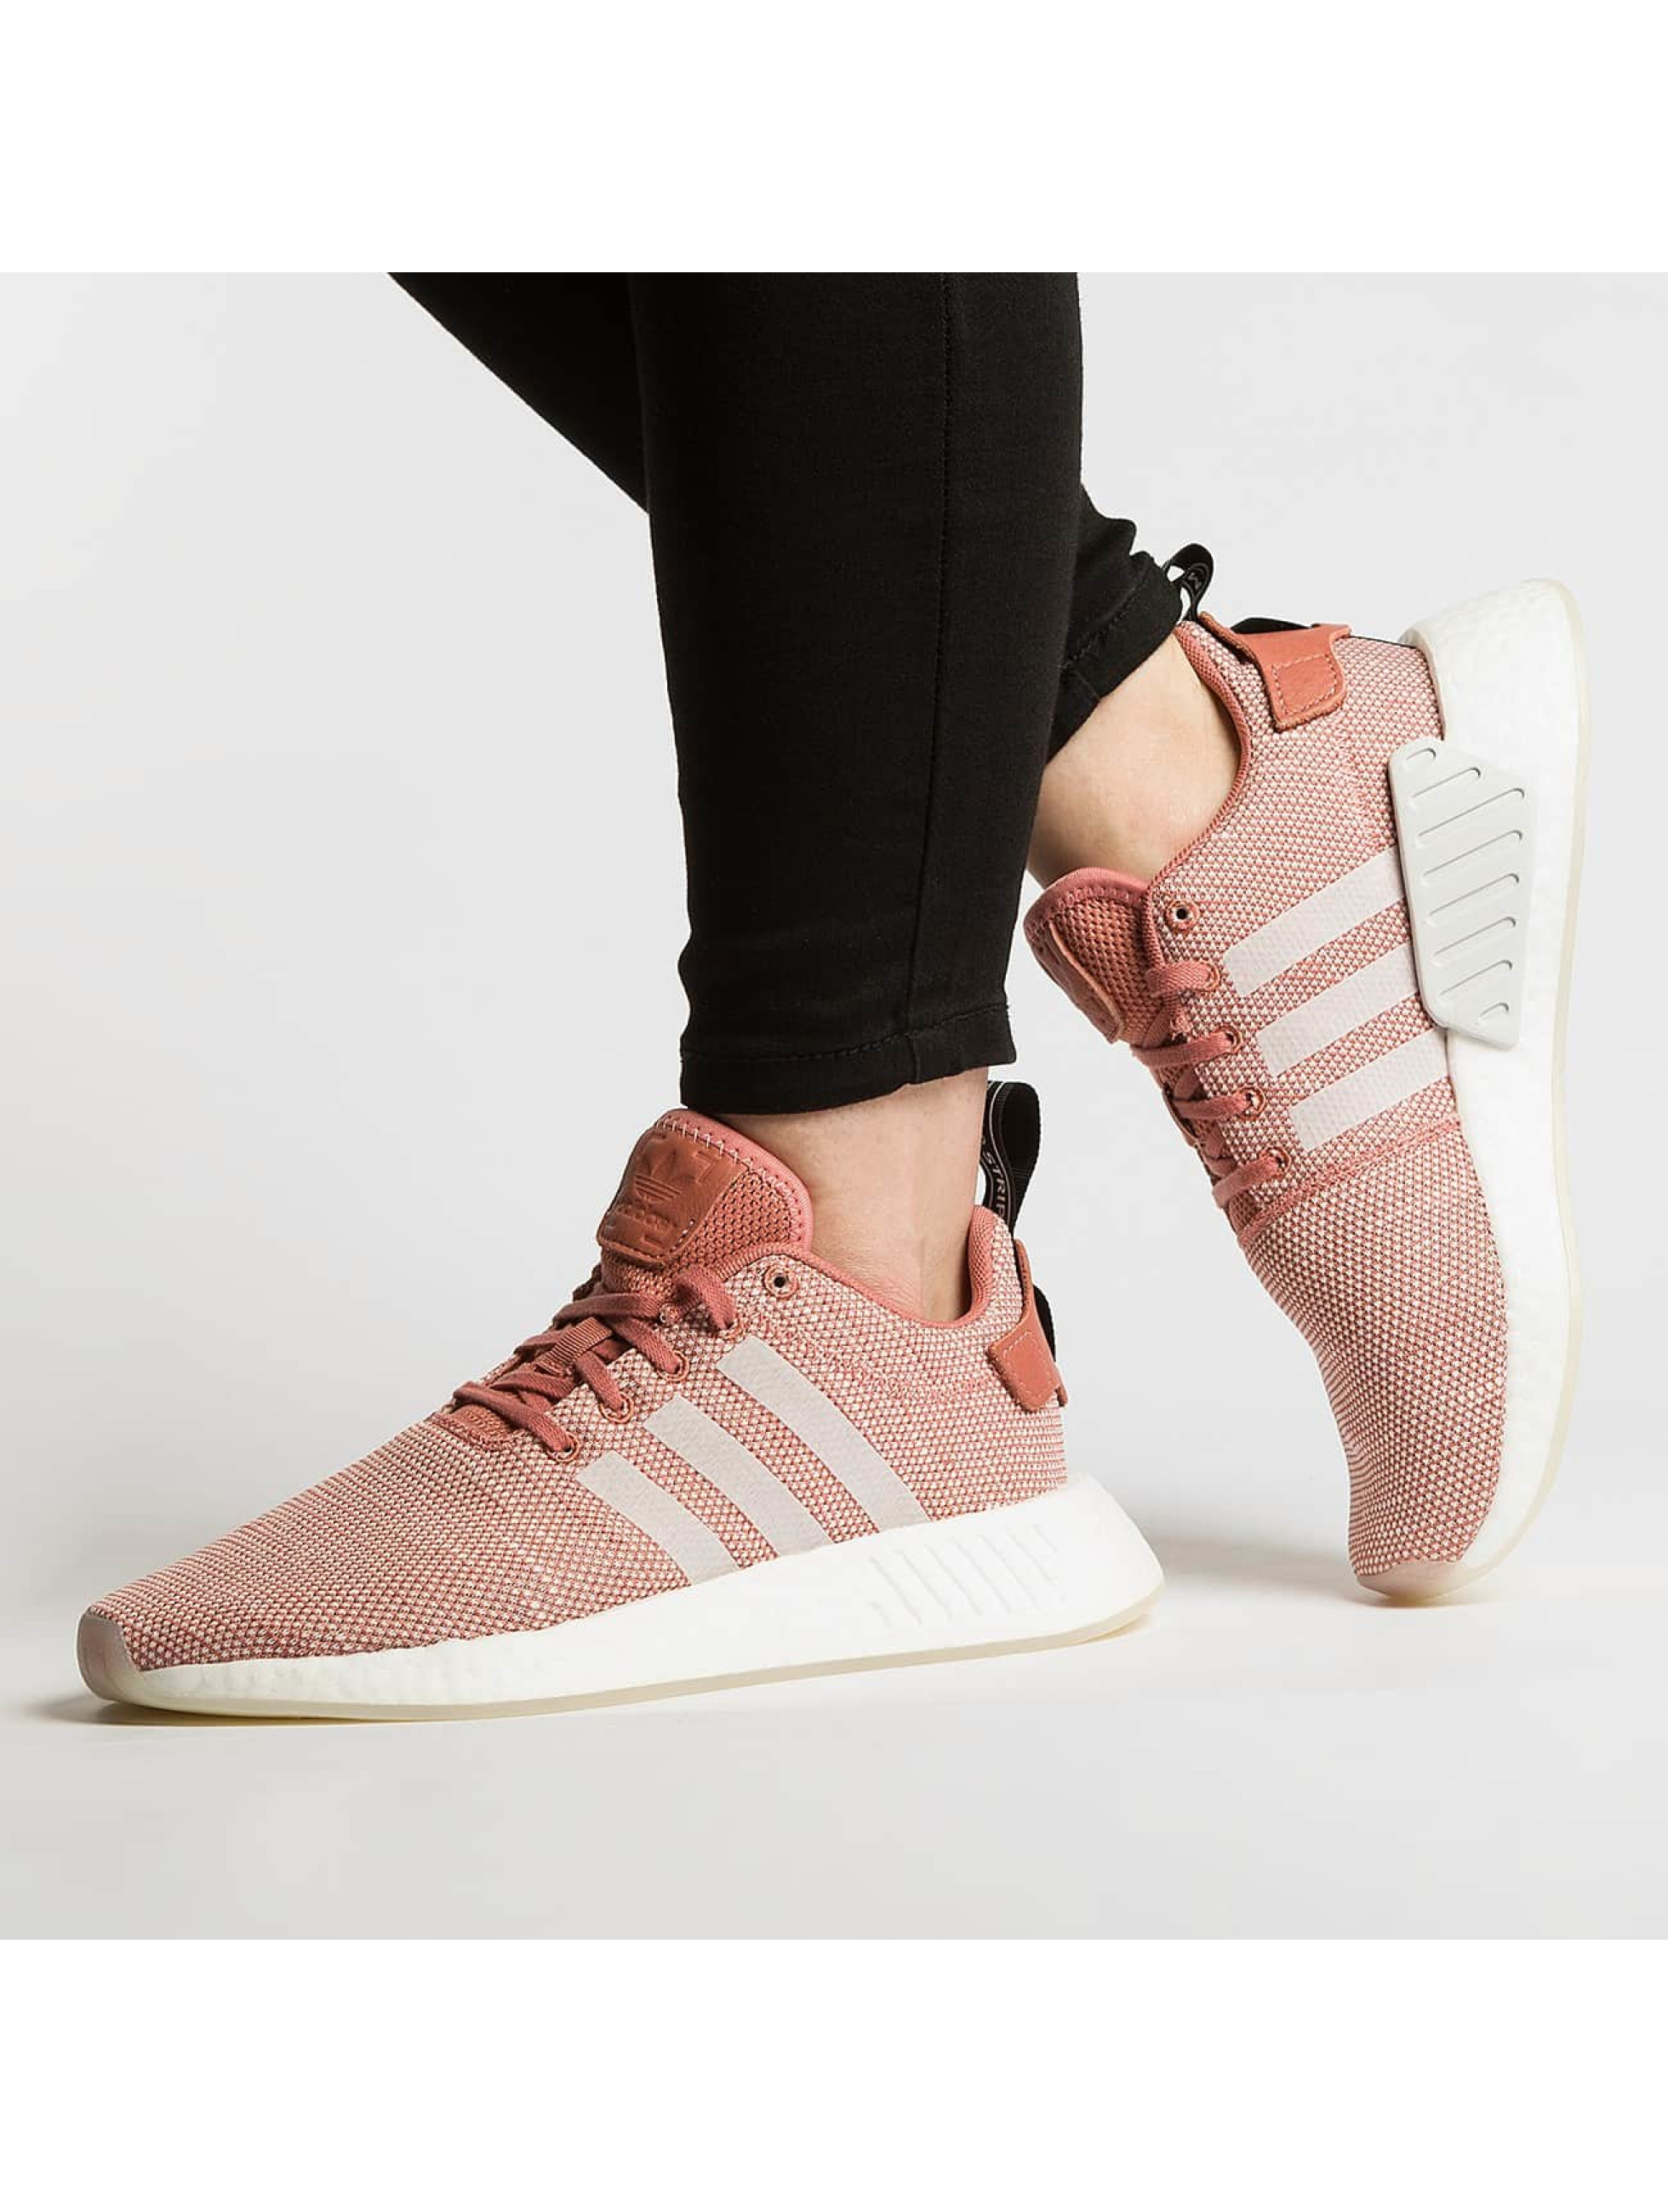 Adidas sko kvinder tilbud bygma padborg tilbud